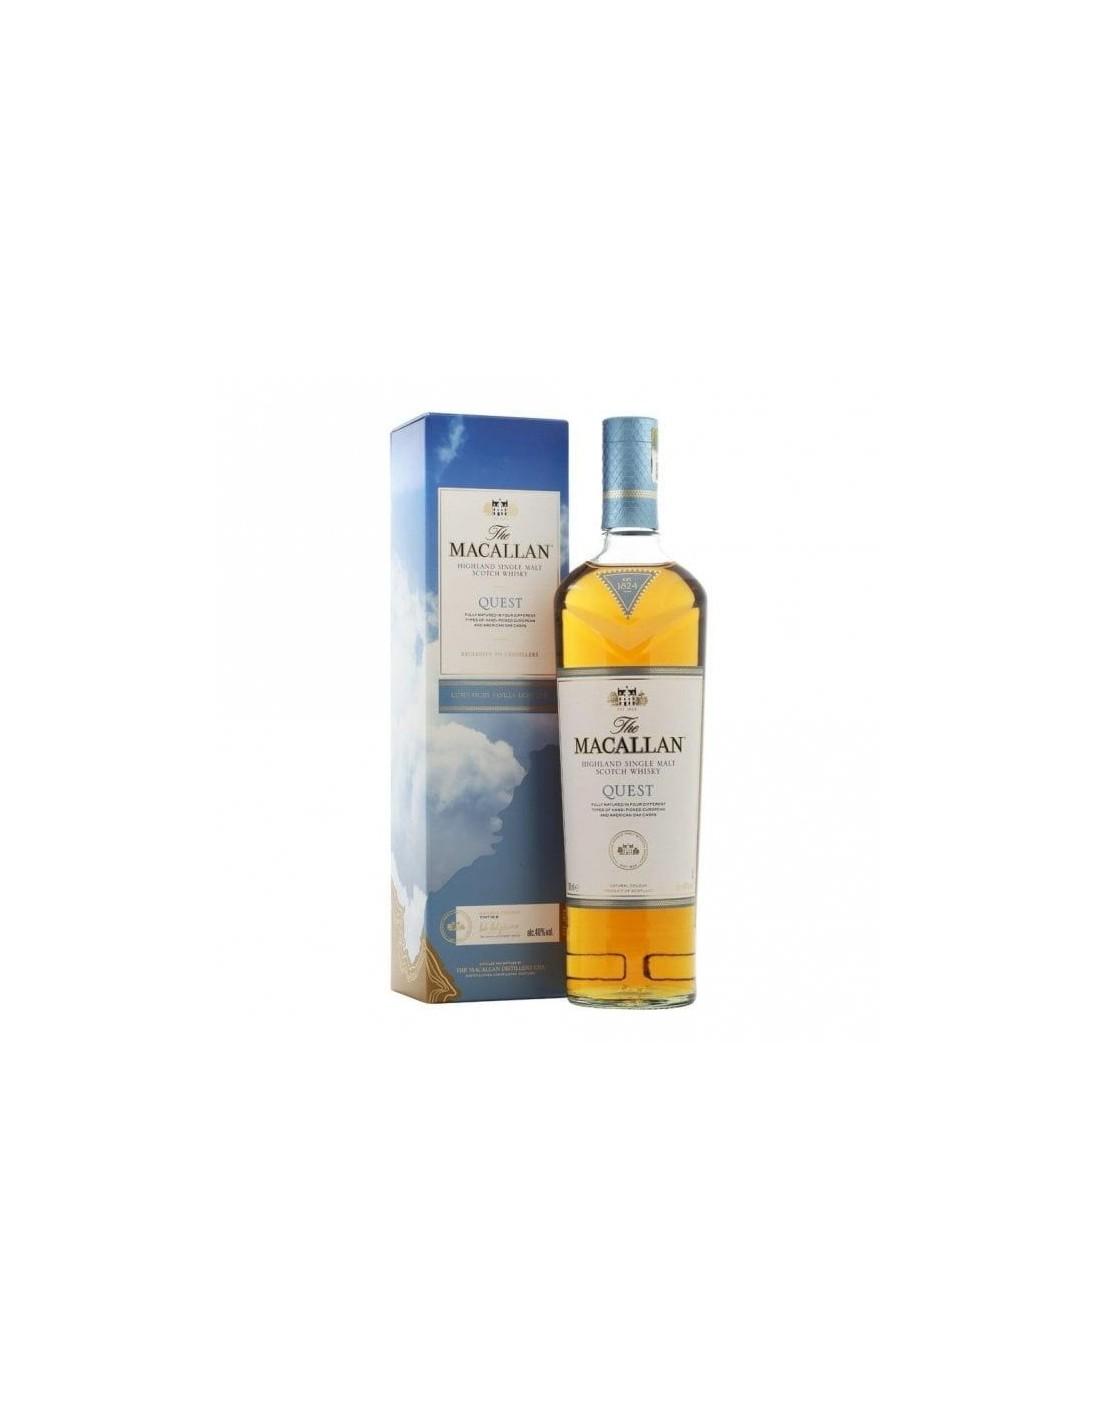 Whisky Macallan Quest Fine Oak, 40% alc., 0.7L, Scotia